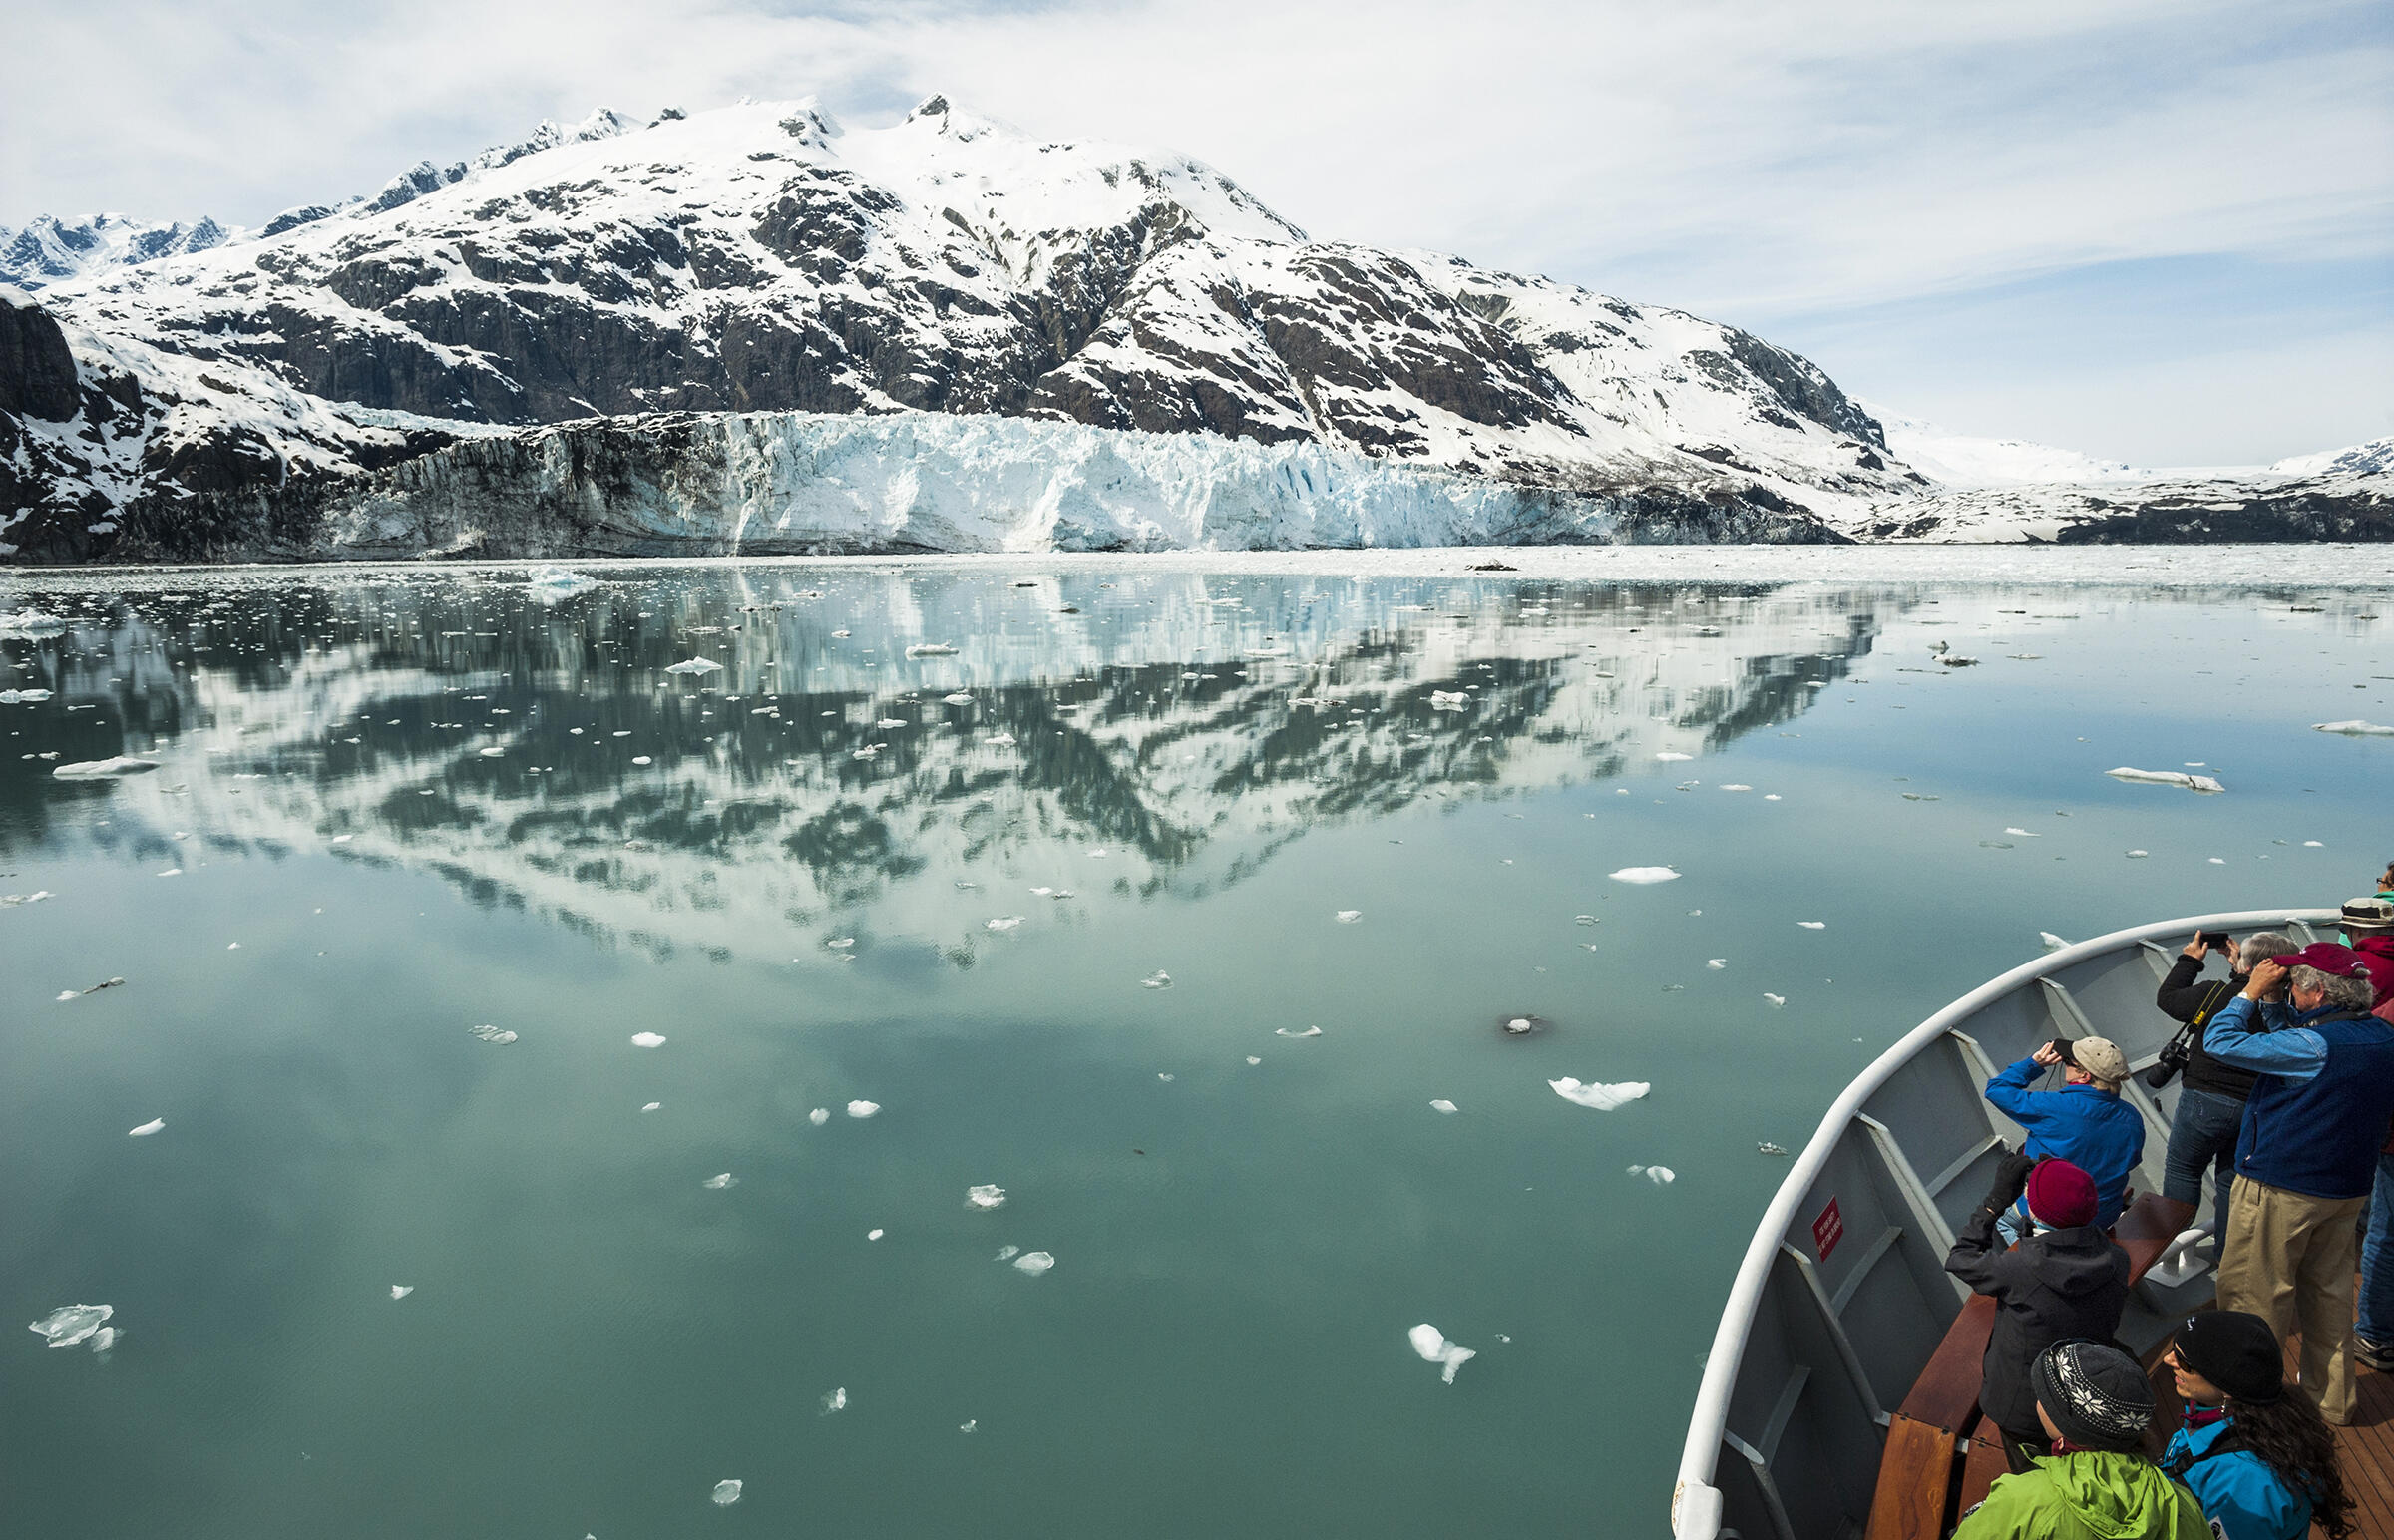 Glacier Bay National Park, Alaska. Jonathan Kingston/Tandemstock.com